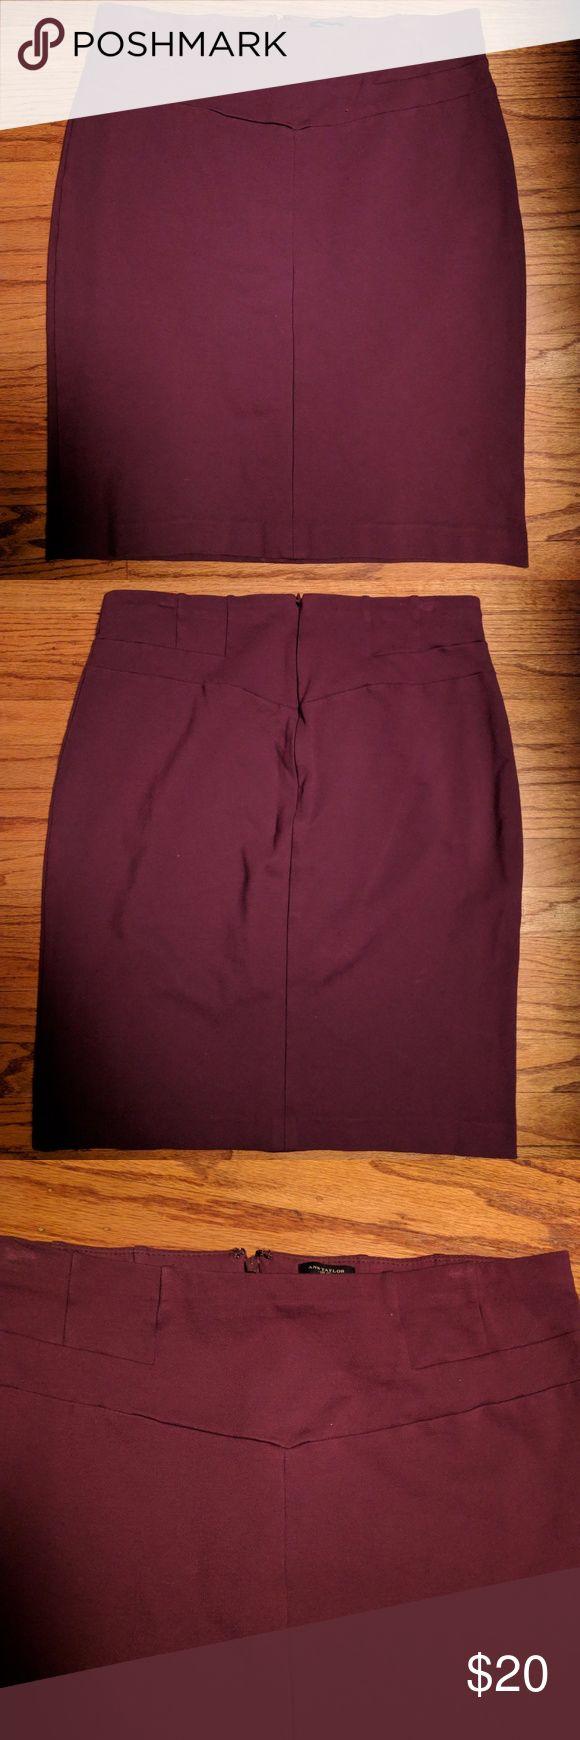 Ann Taylor Purple pencil Skirt Stretchy purple or dark mauve skirt. Zipper on back. Elastic waist. Details around waist. Ann Taylor Skirts Pencil